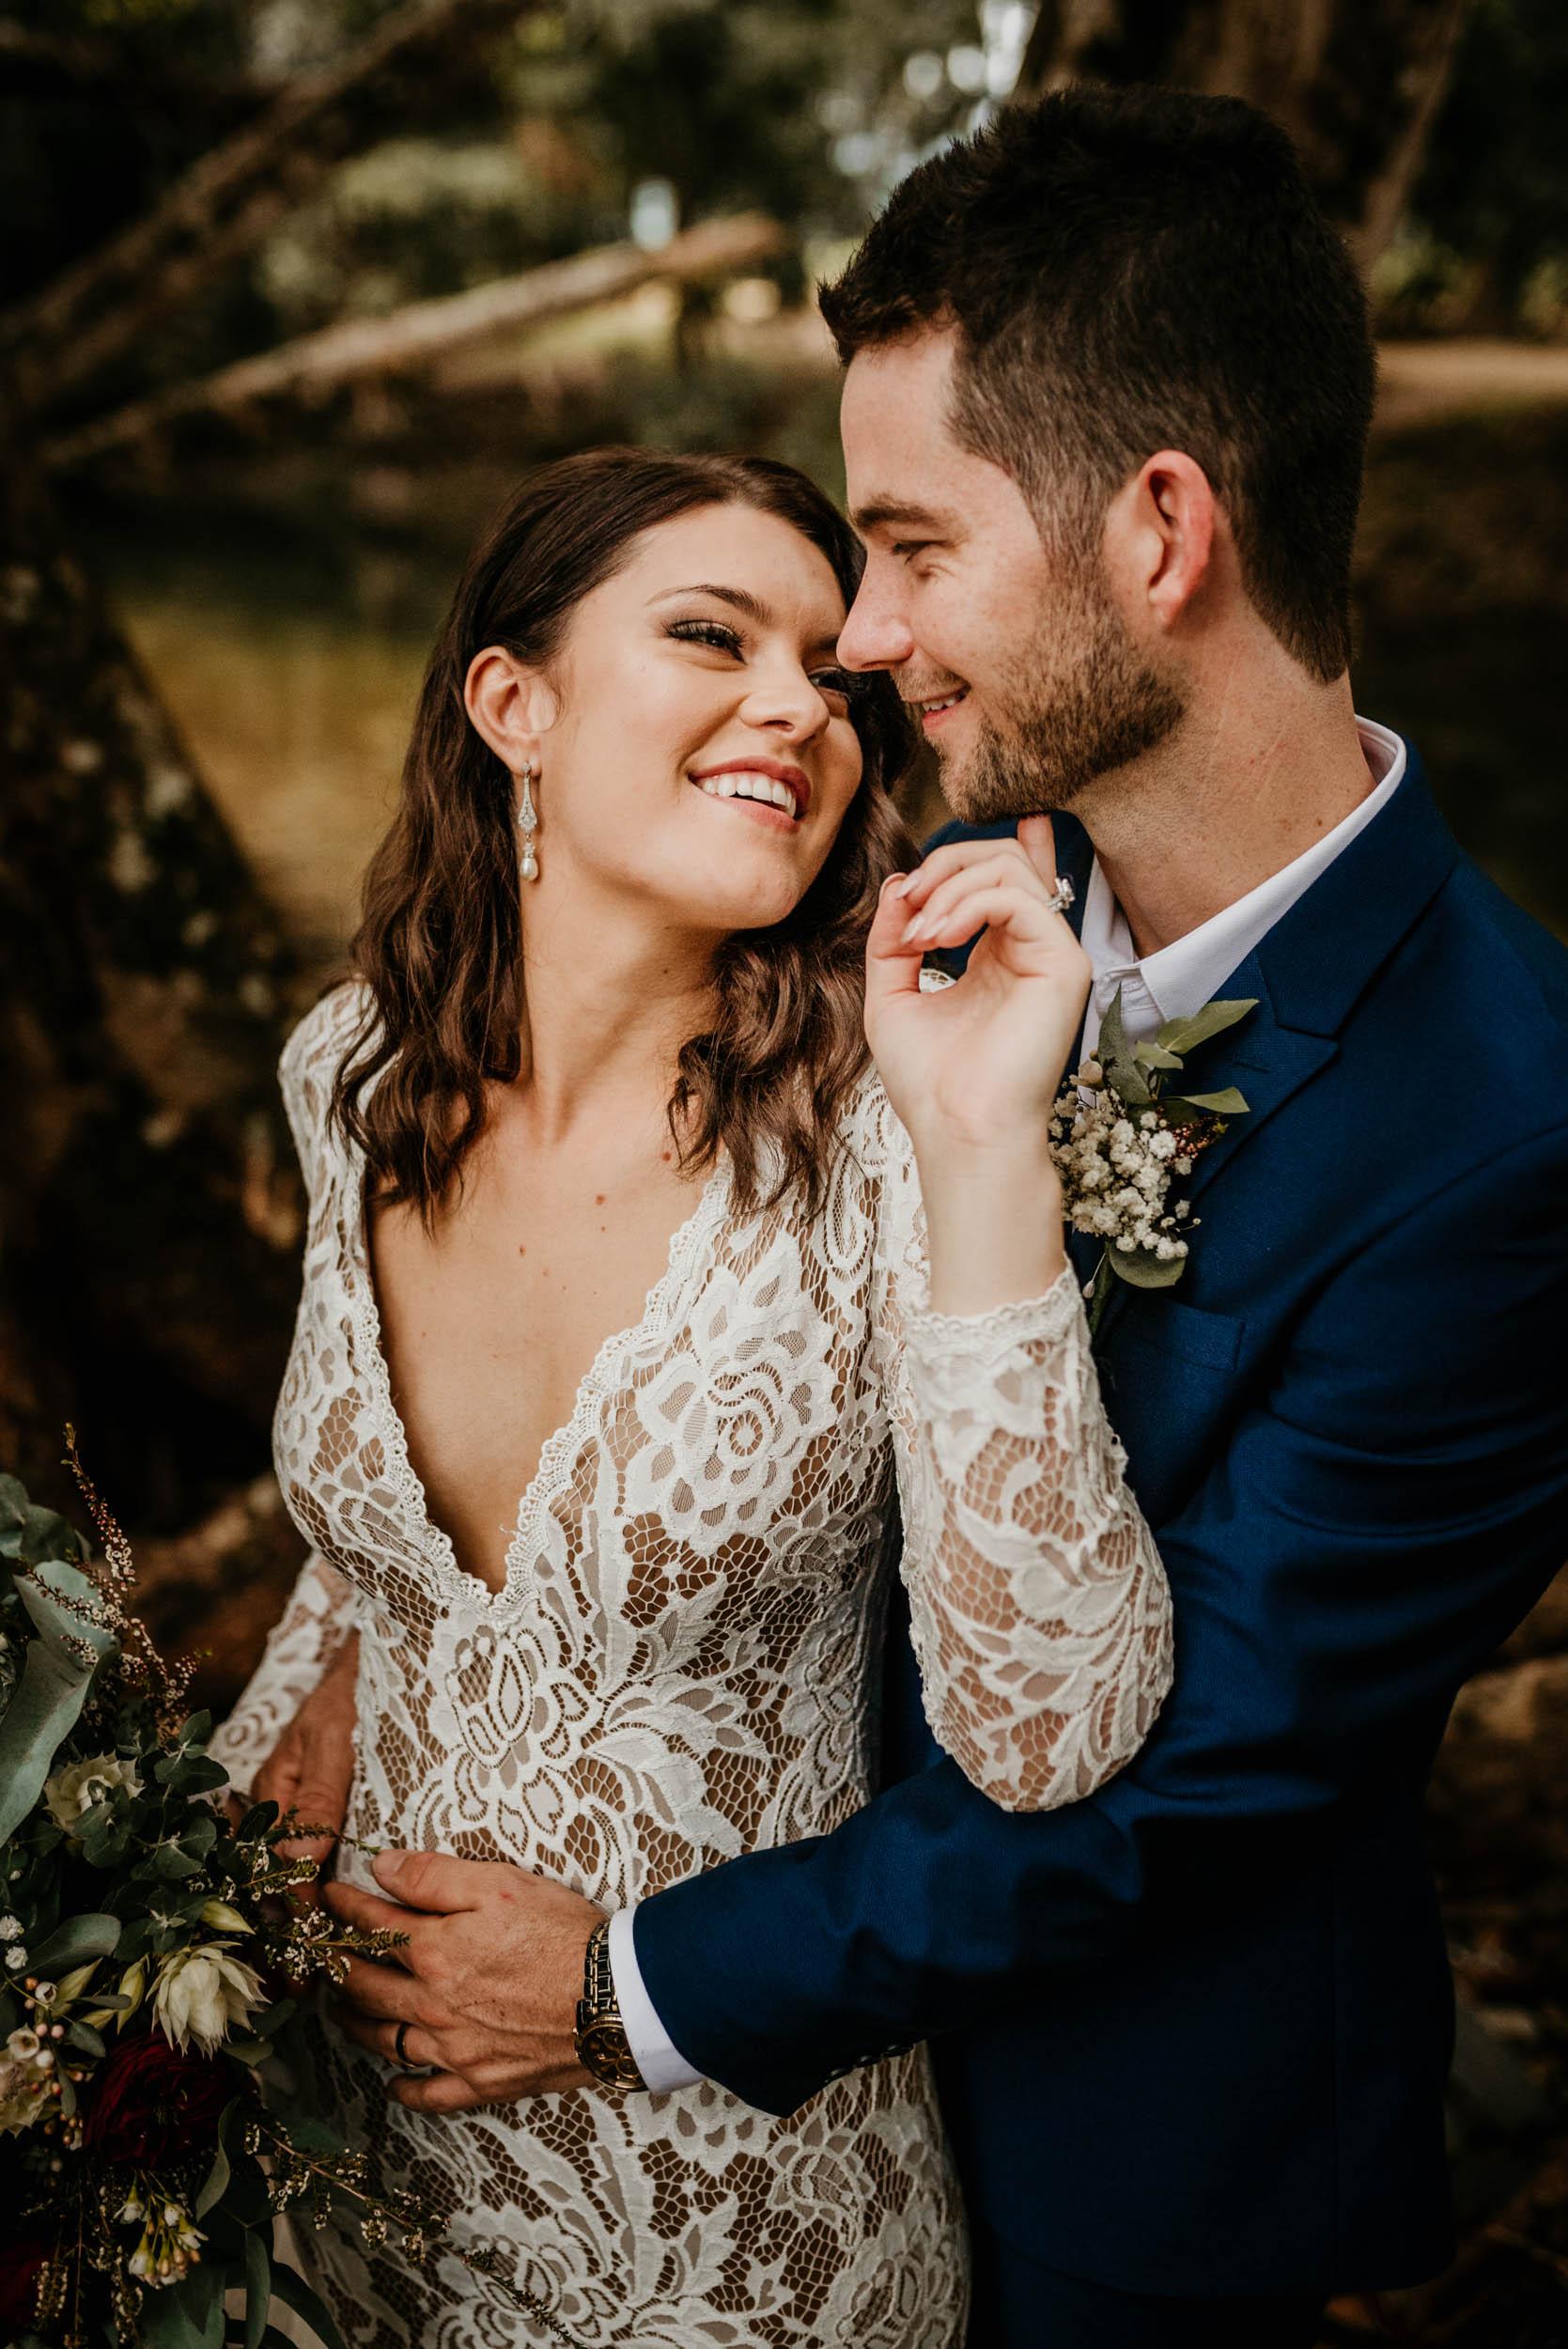 The Raw Photographer - Cairns and Port Douglas Wedding Photographer - Best of 2018-42.jpg